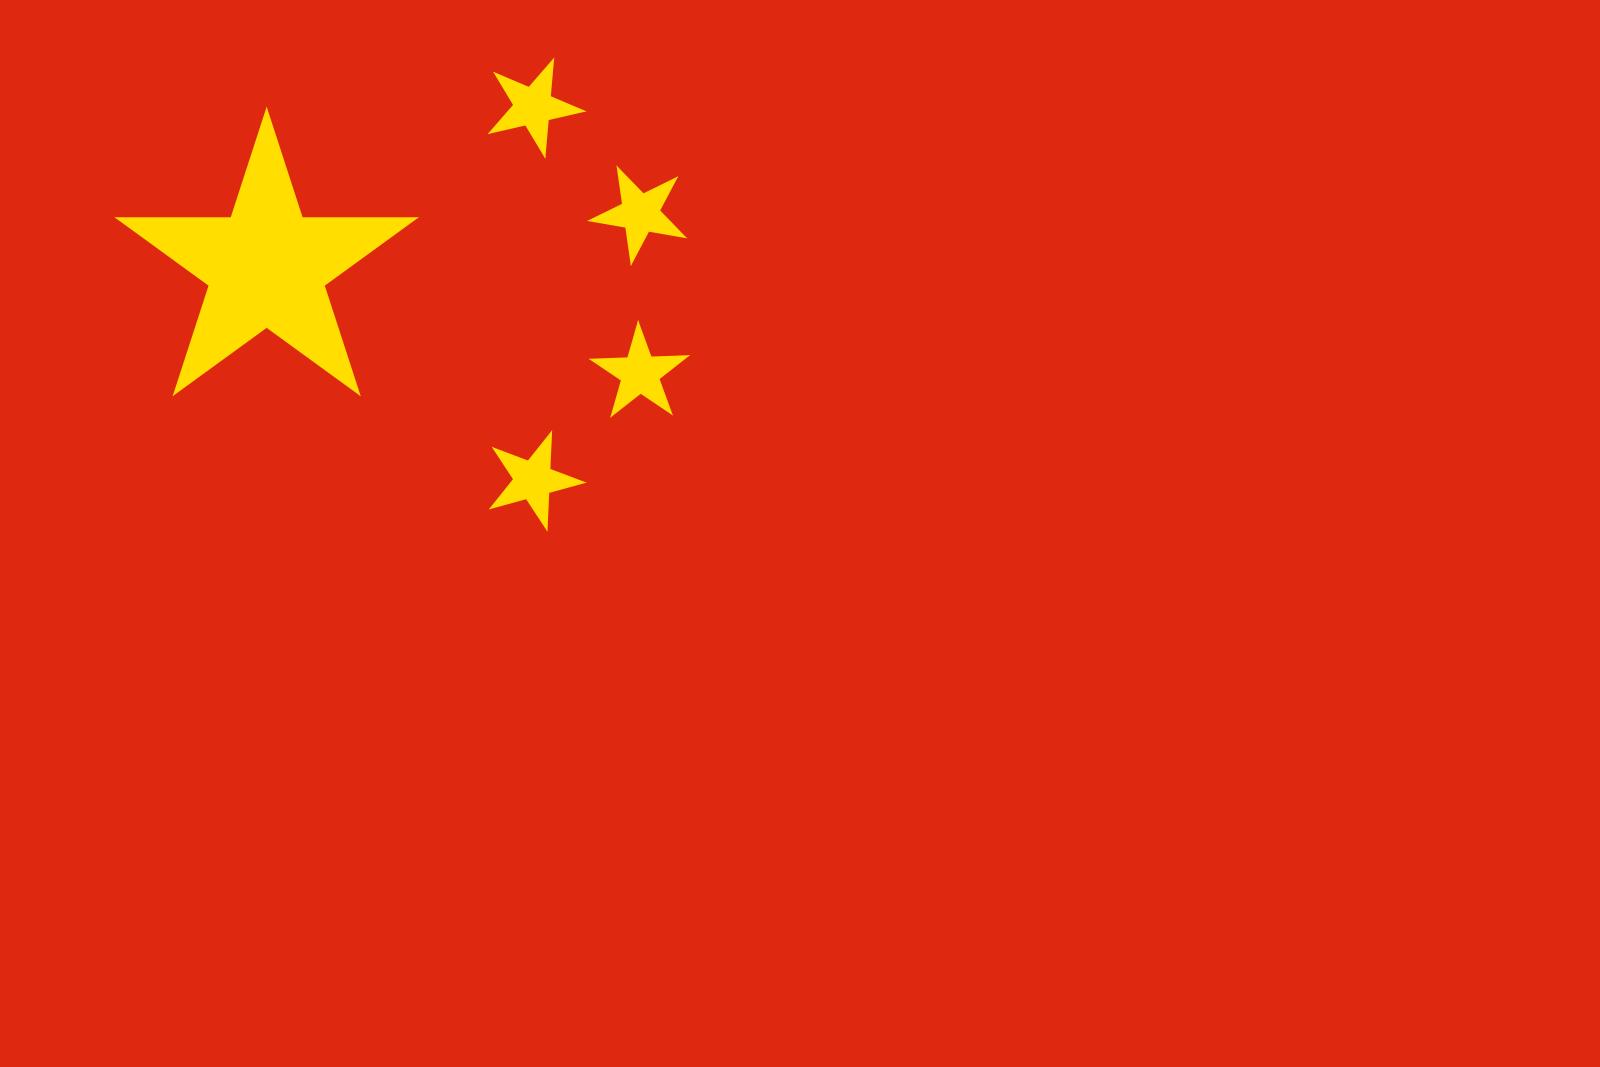 China Wants To Host The 2030 World Cup Banderas Del Mundo